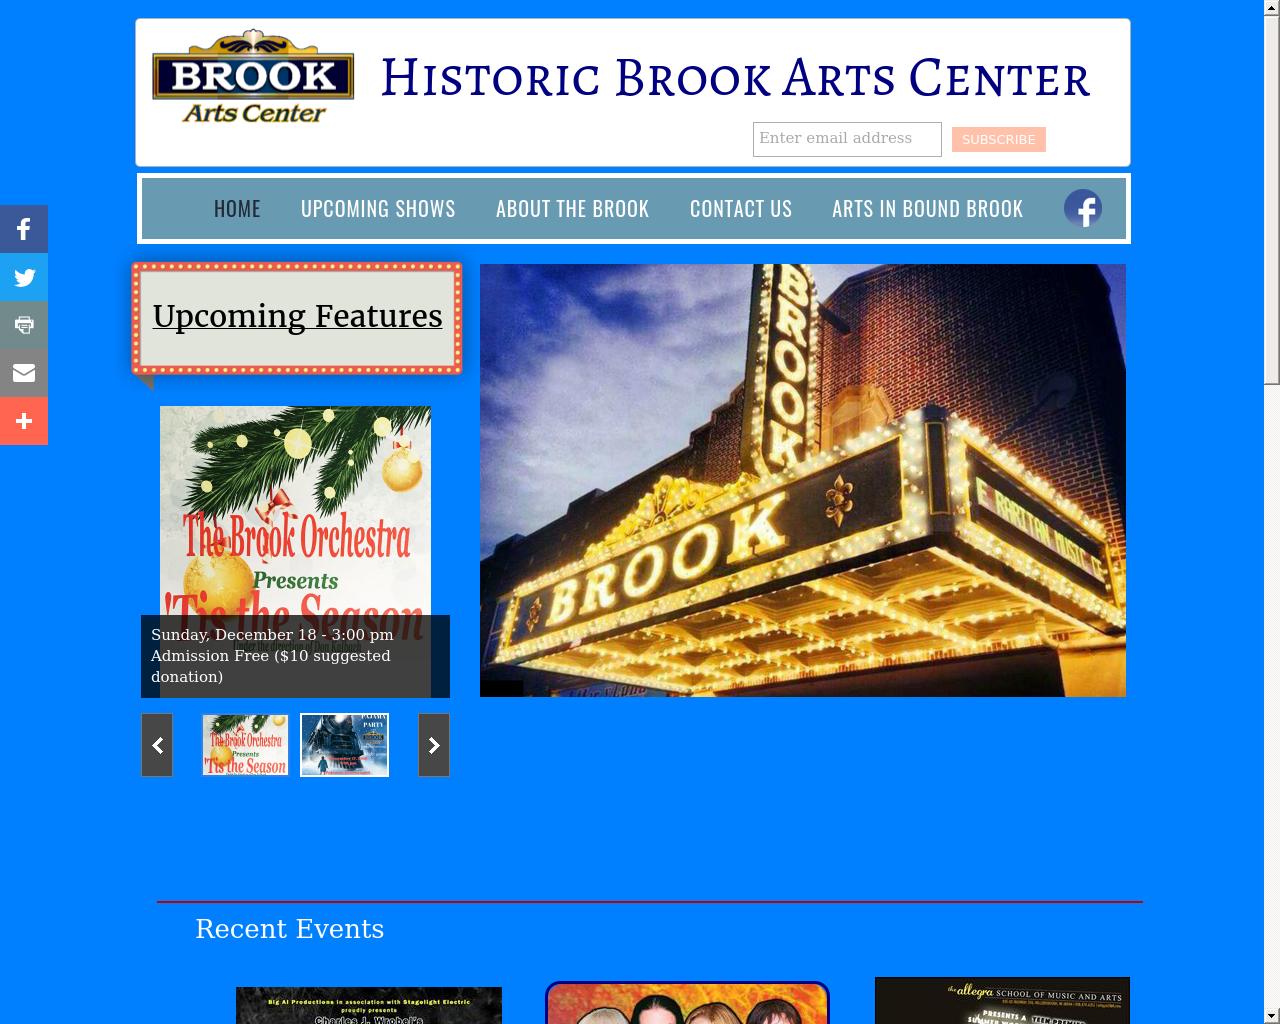 Brook-Arts-Center-Advertising-Reviews-Pricing